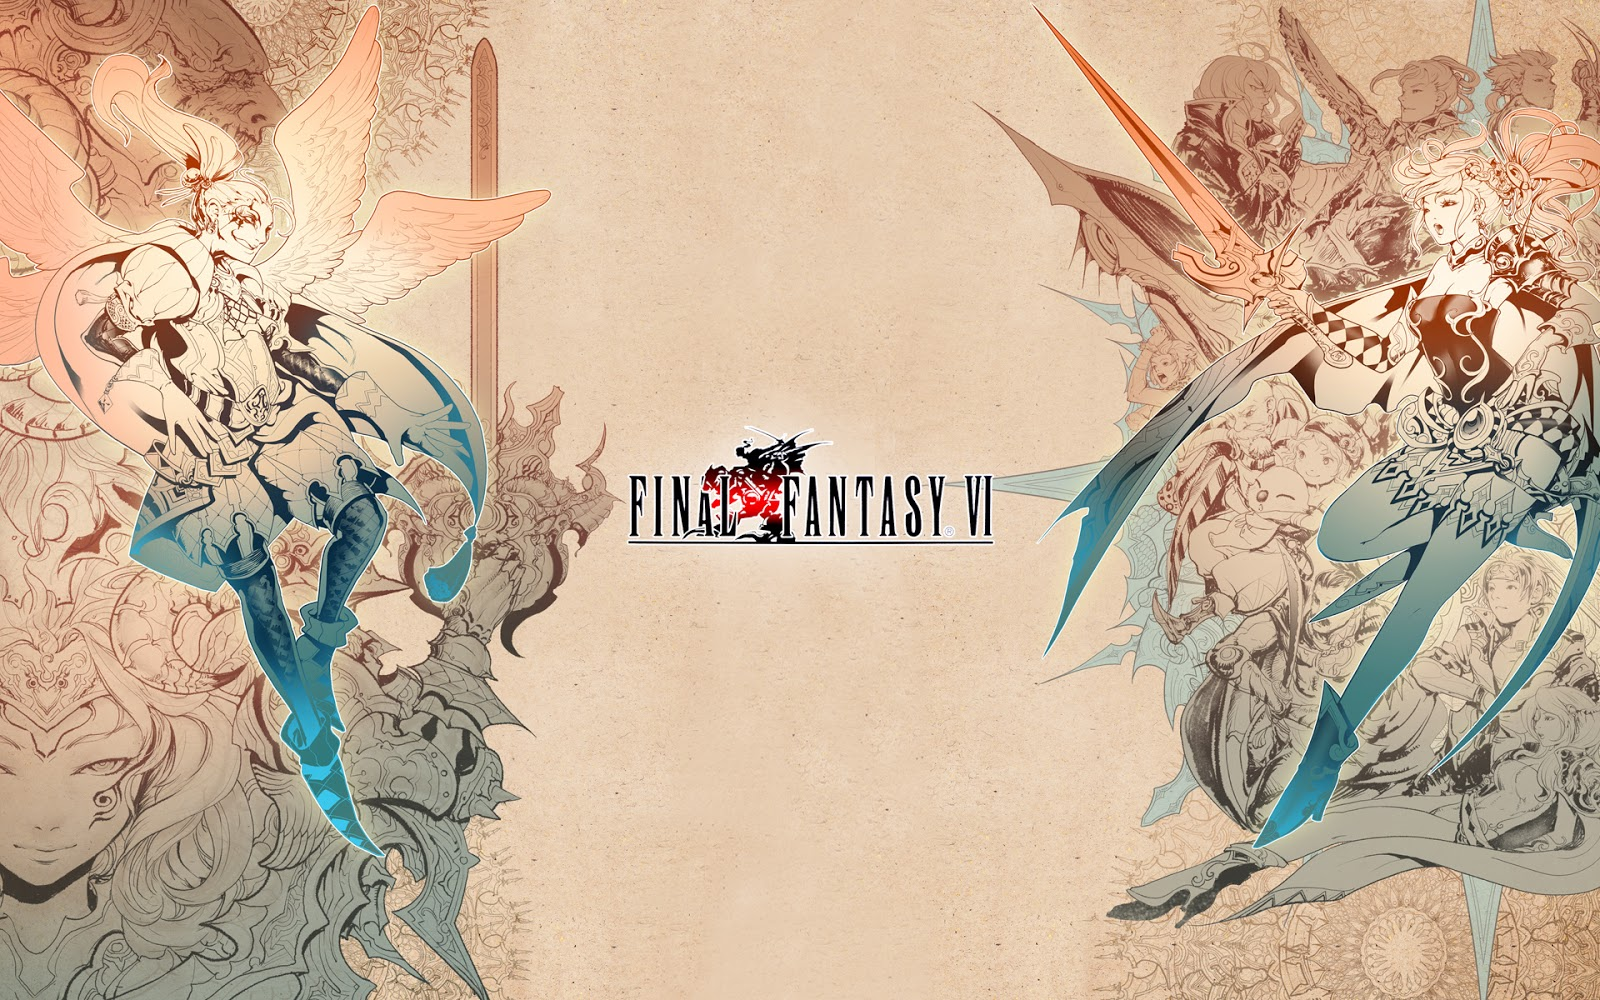 Final Fantasy VI wallpaper hd